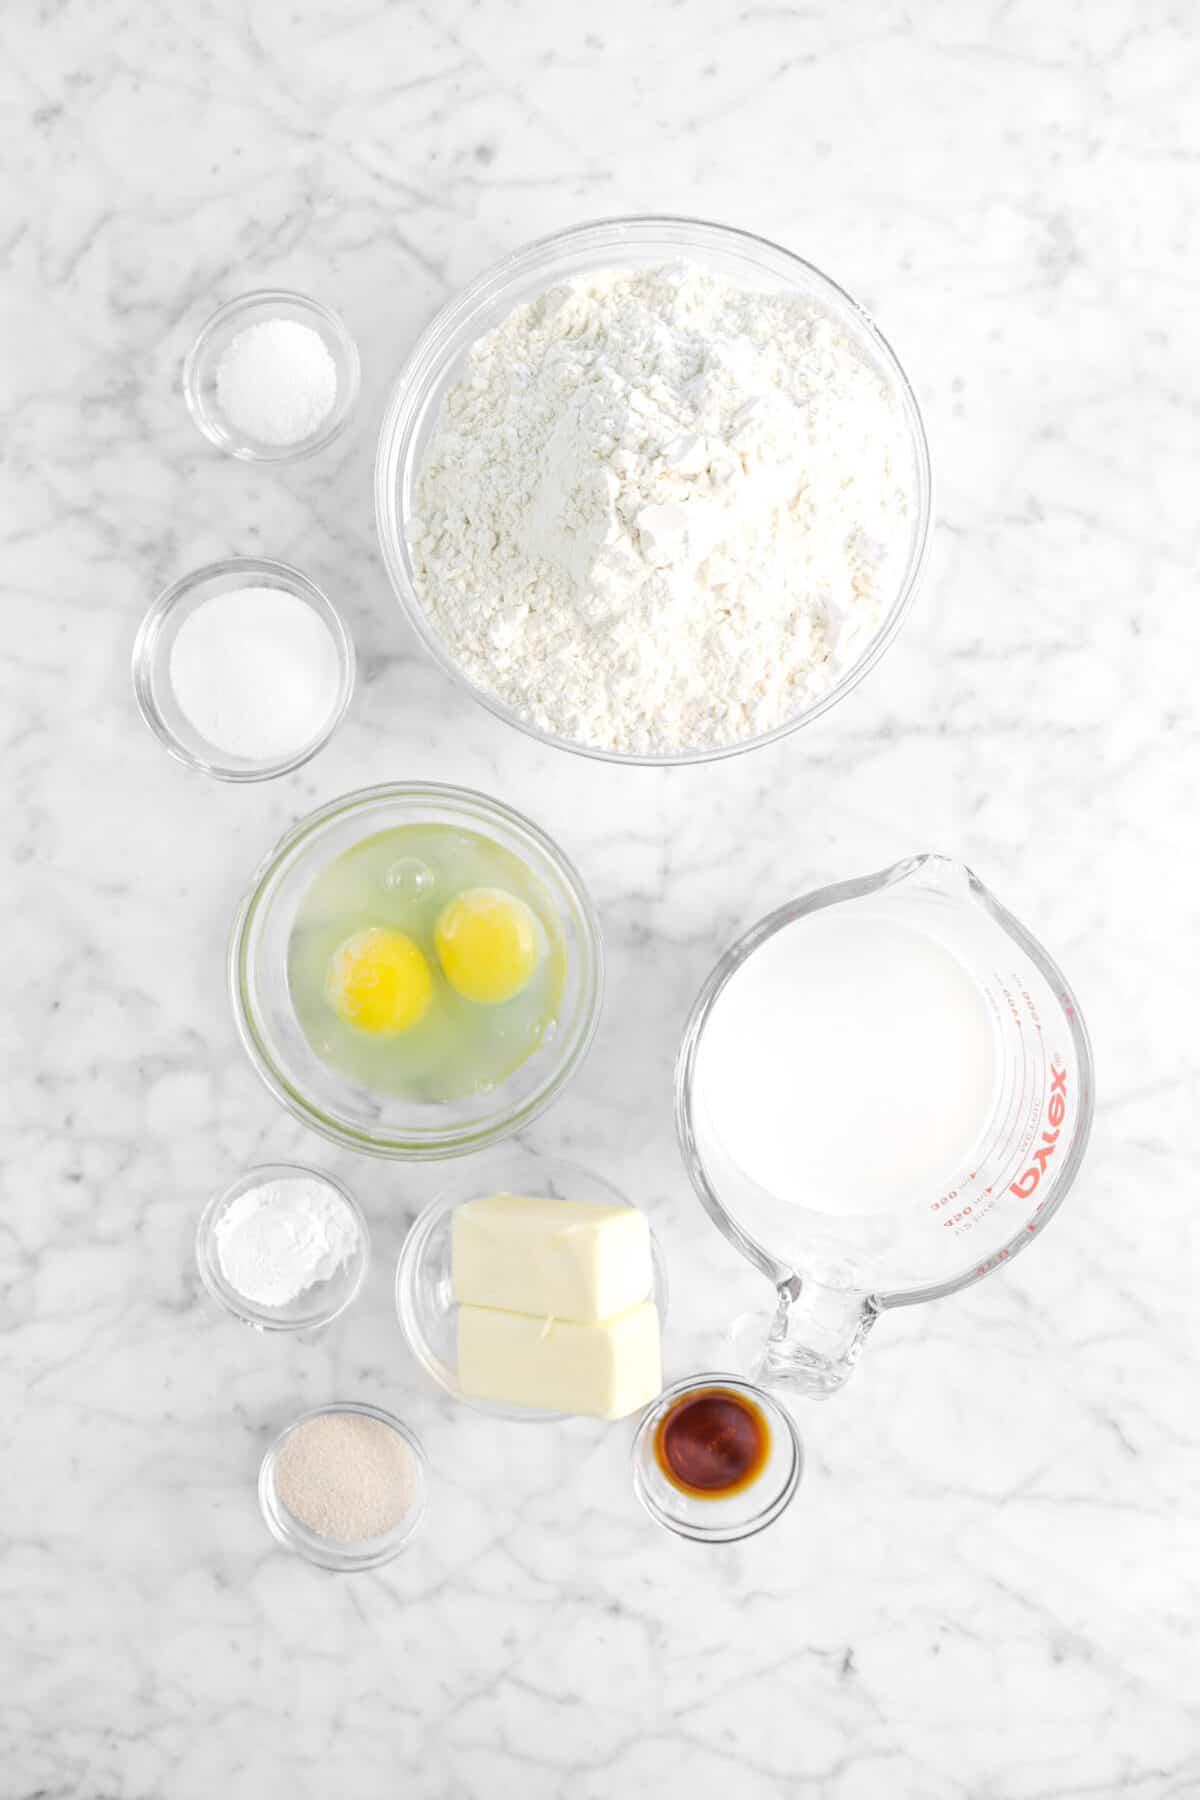 salt, sugar, flour, eggs, milk, butter, baking powder, yeast, and vanilla on marble counter